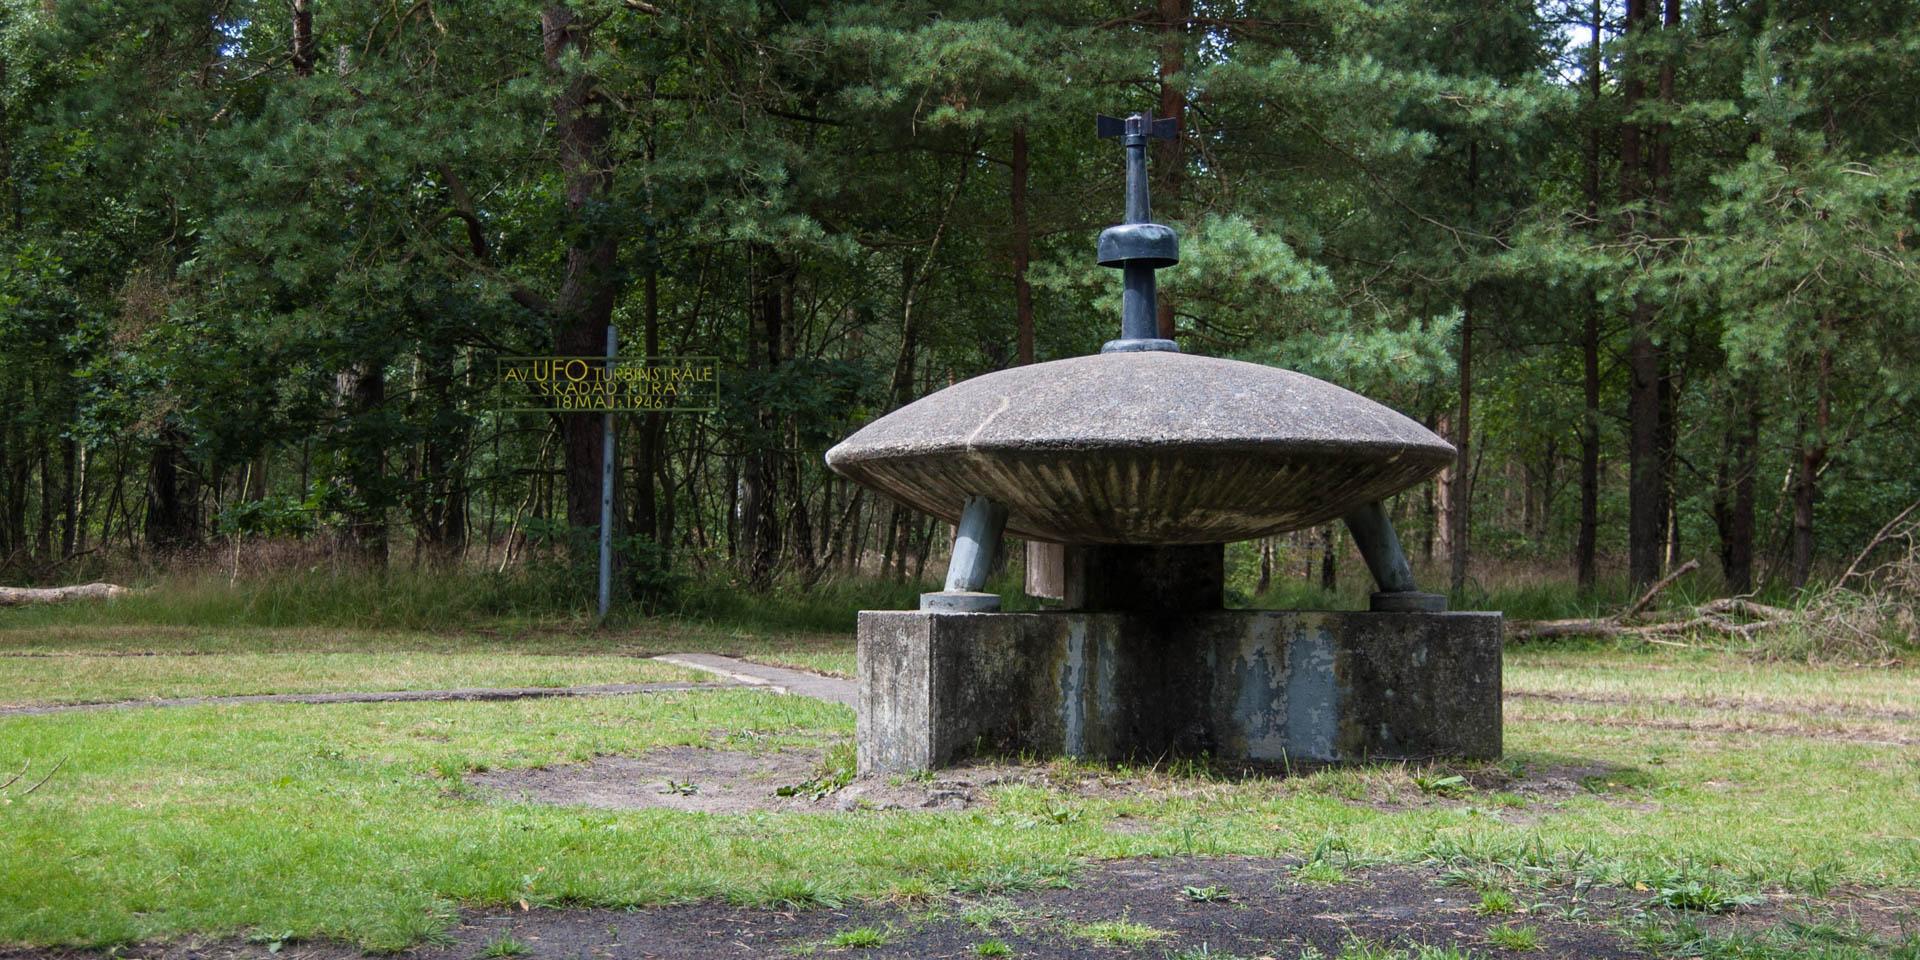 UFO-Monumentet 2015